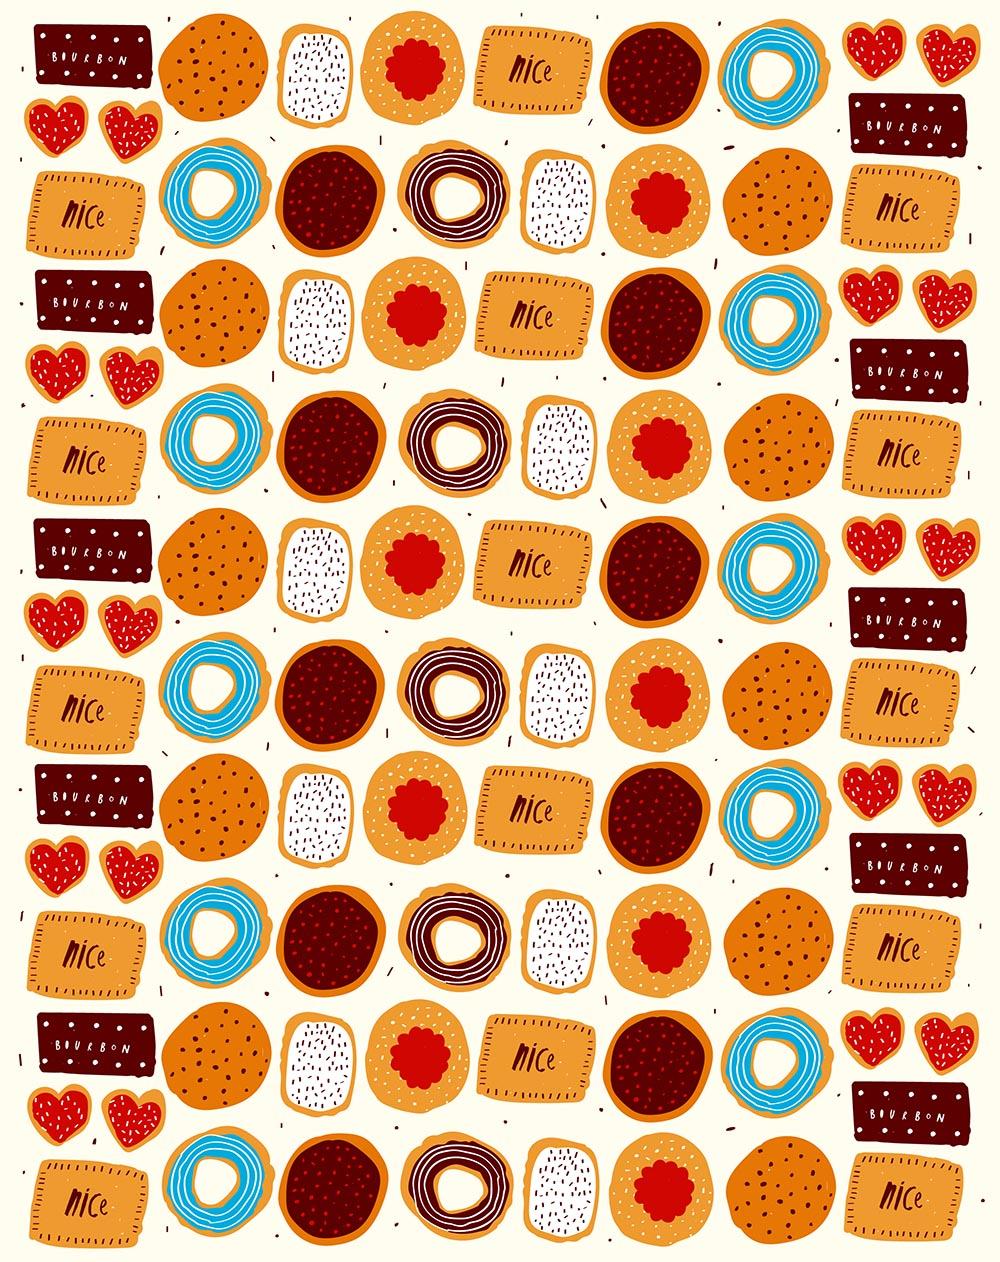 biscuits pattern_Nikki Miles-01 copy.jpg